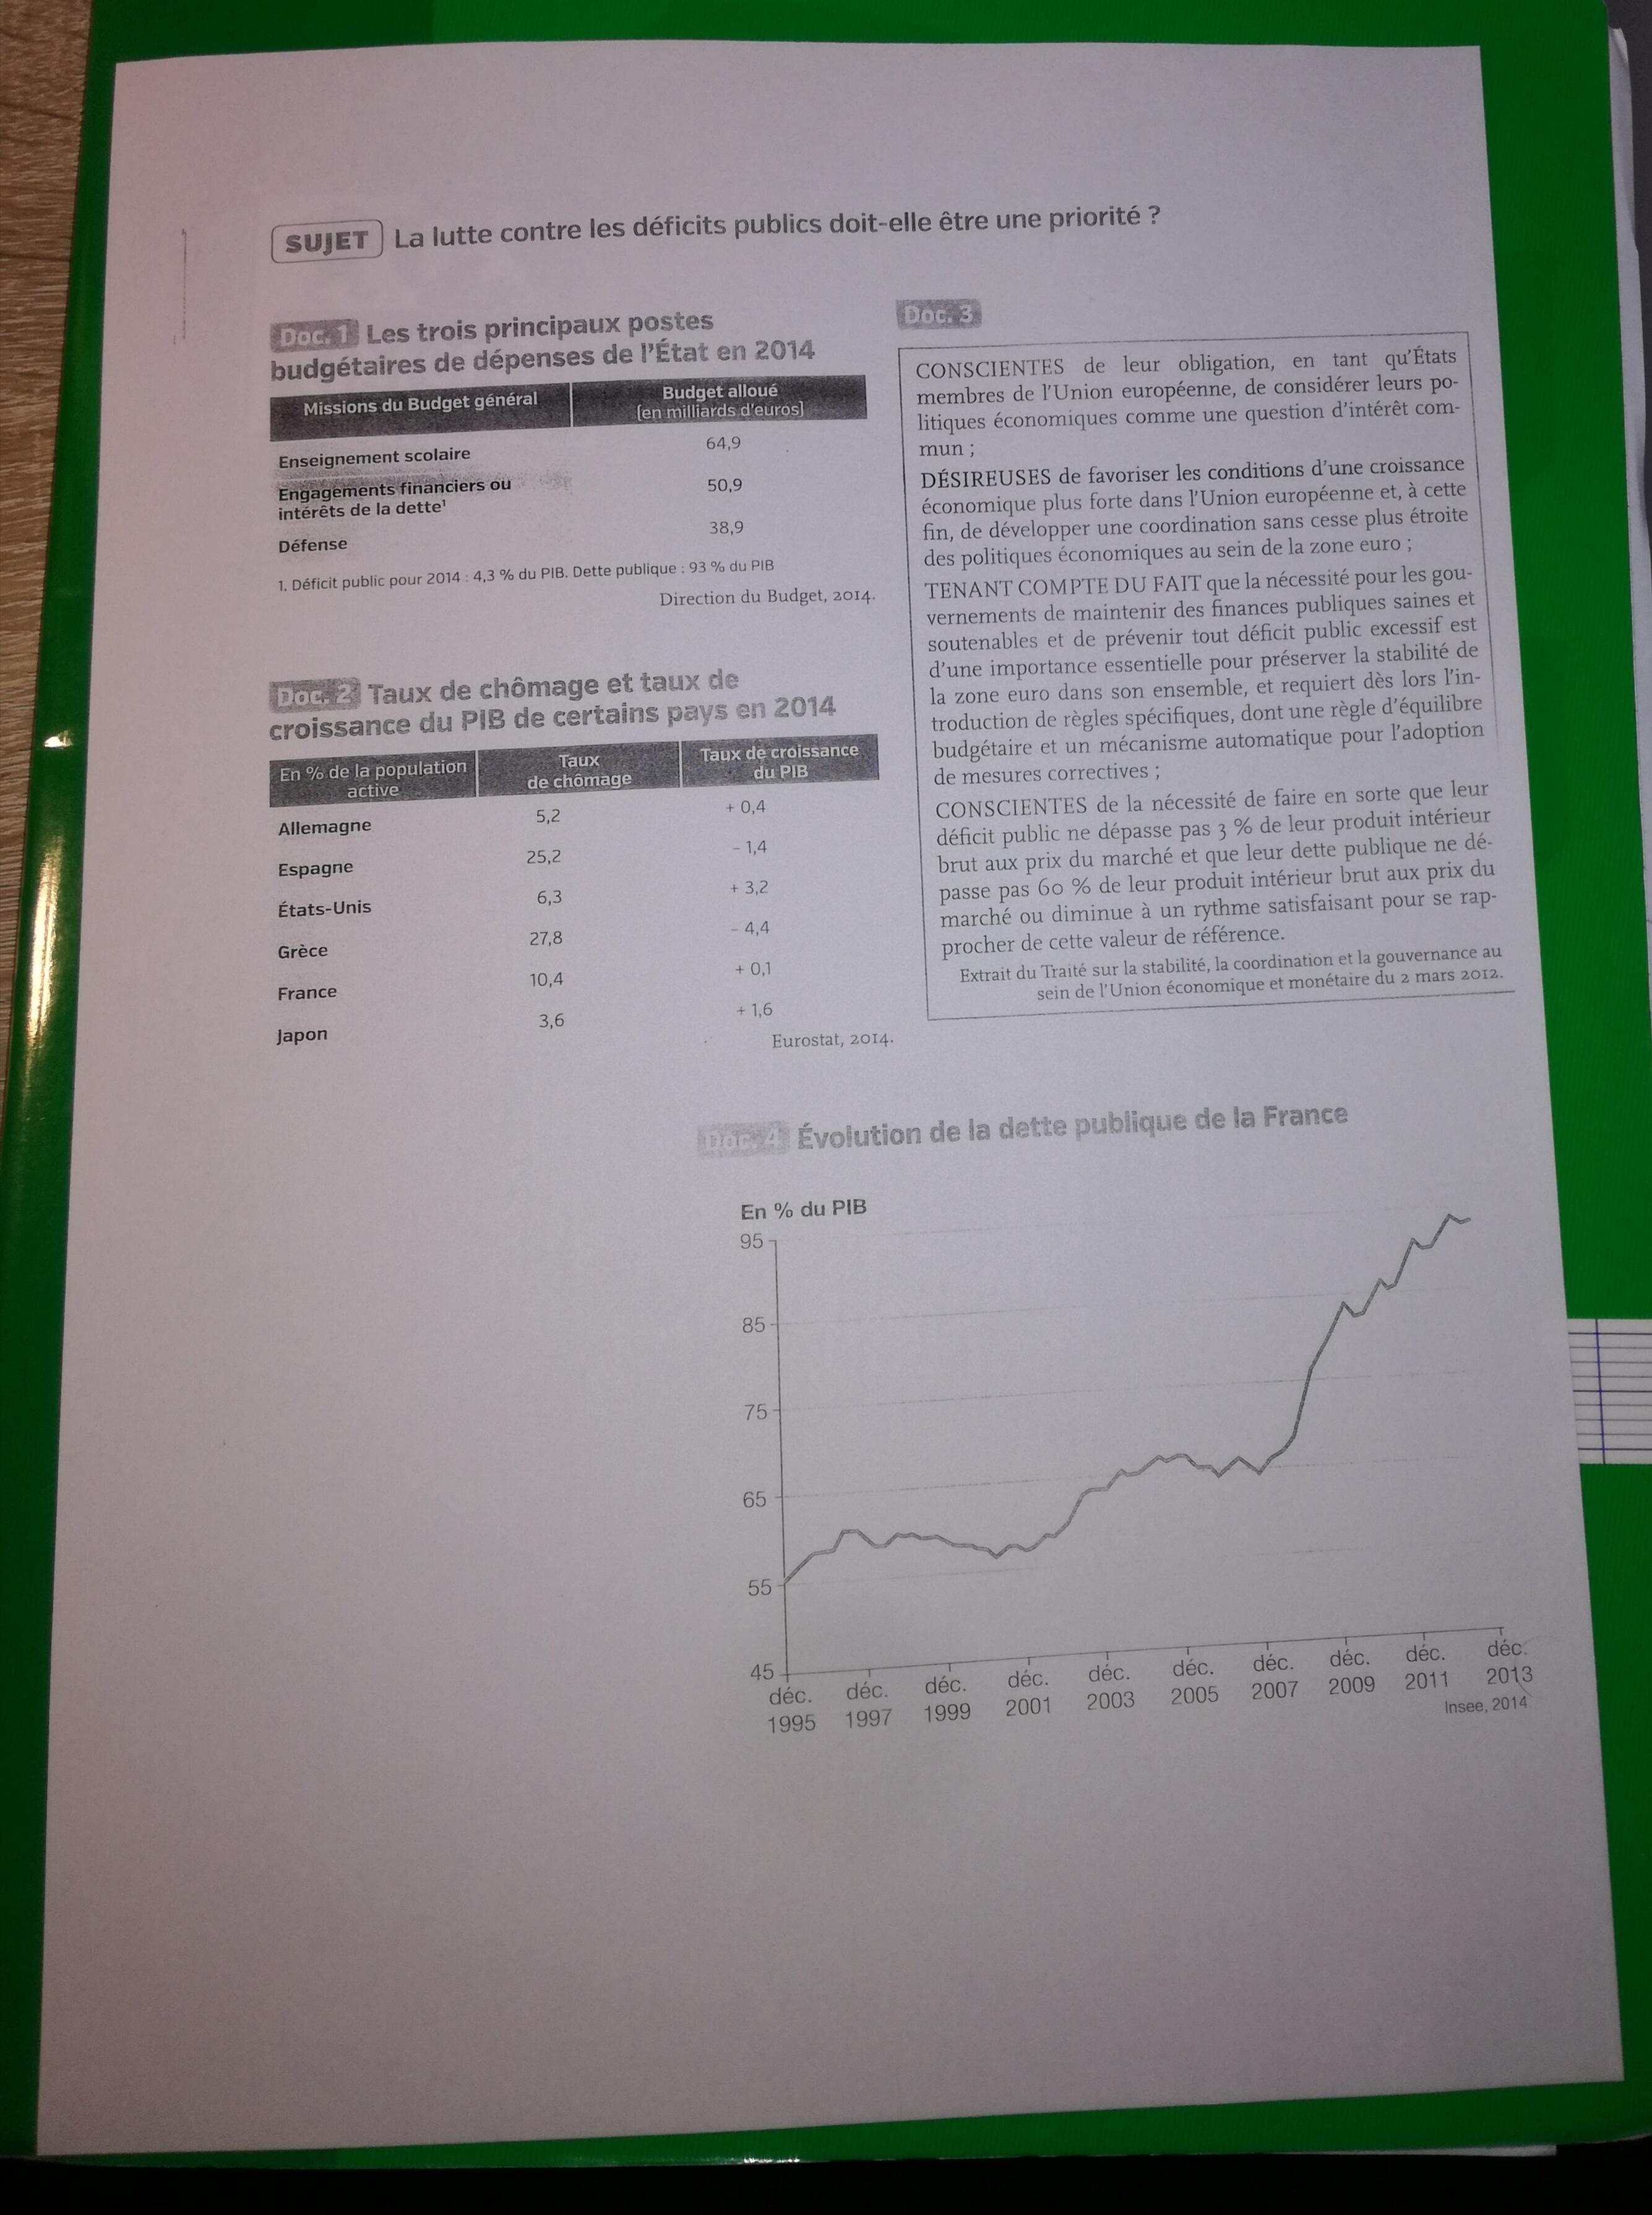 accroche dissertation ses pib